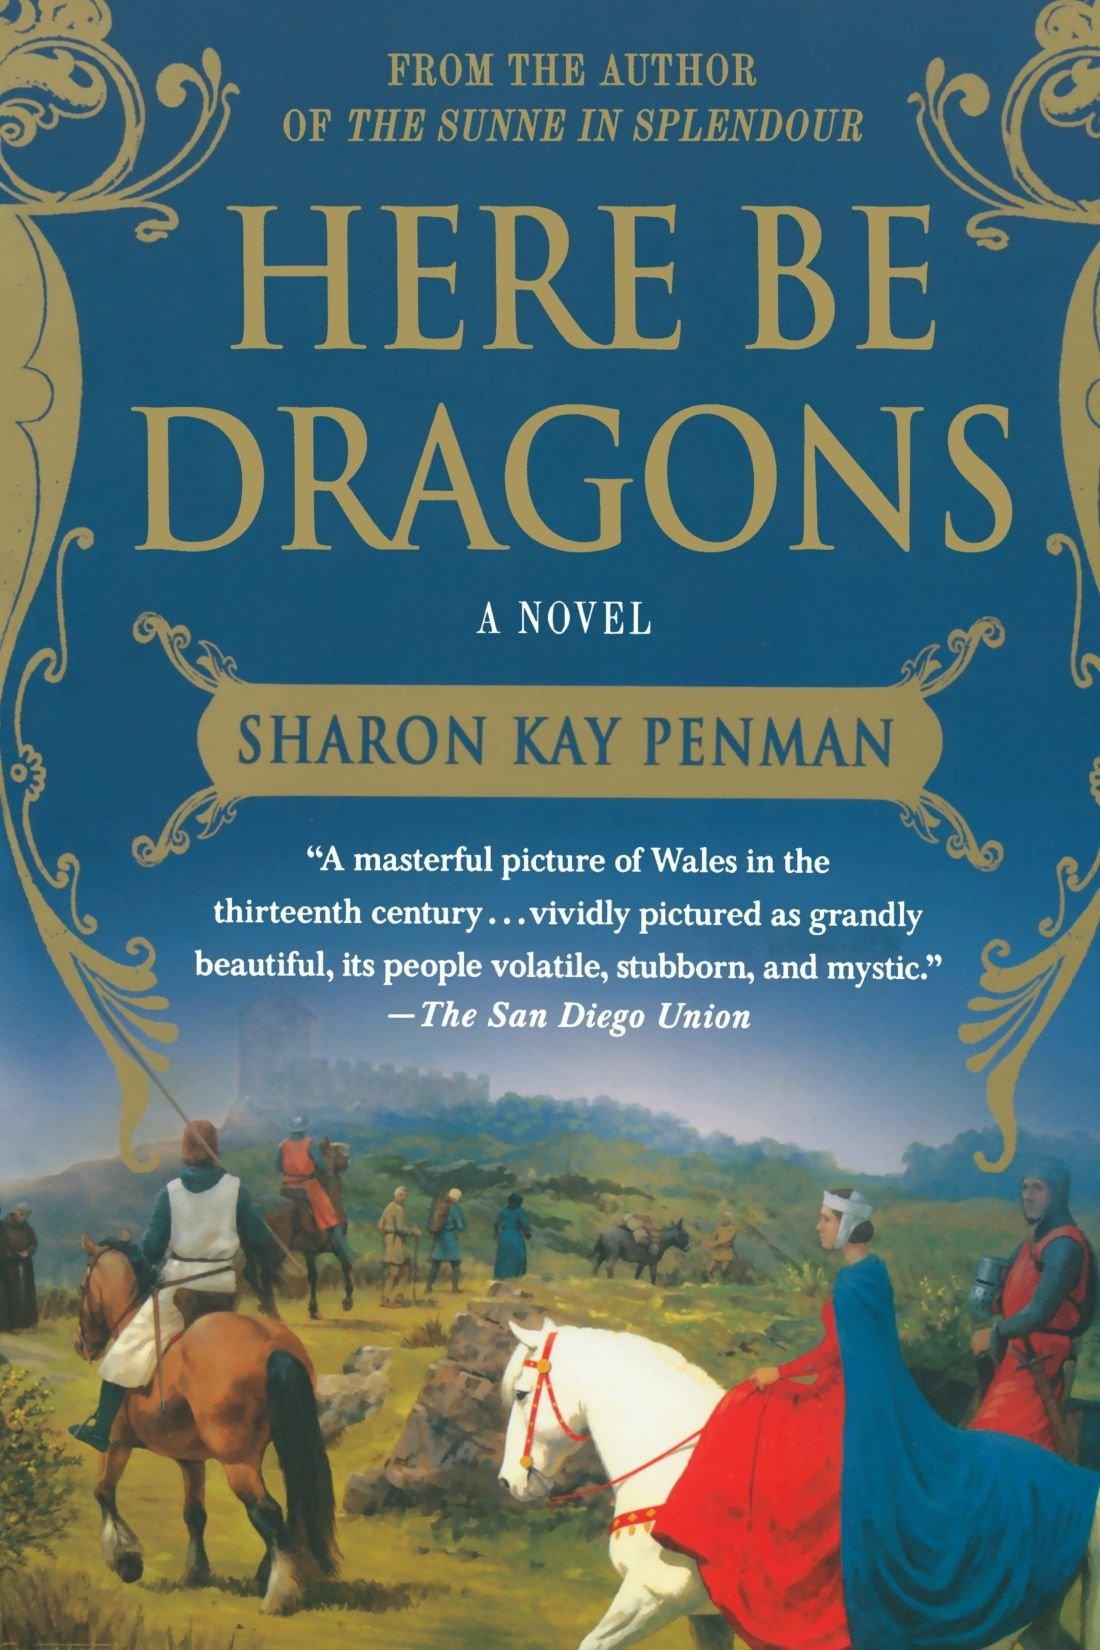 Amazon.com: Here Be Dragons: A Novel (Welsh Princes Trilogy)  (9780312382452): Sharon Kay Penman: Books